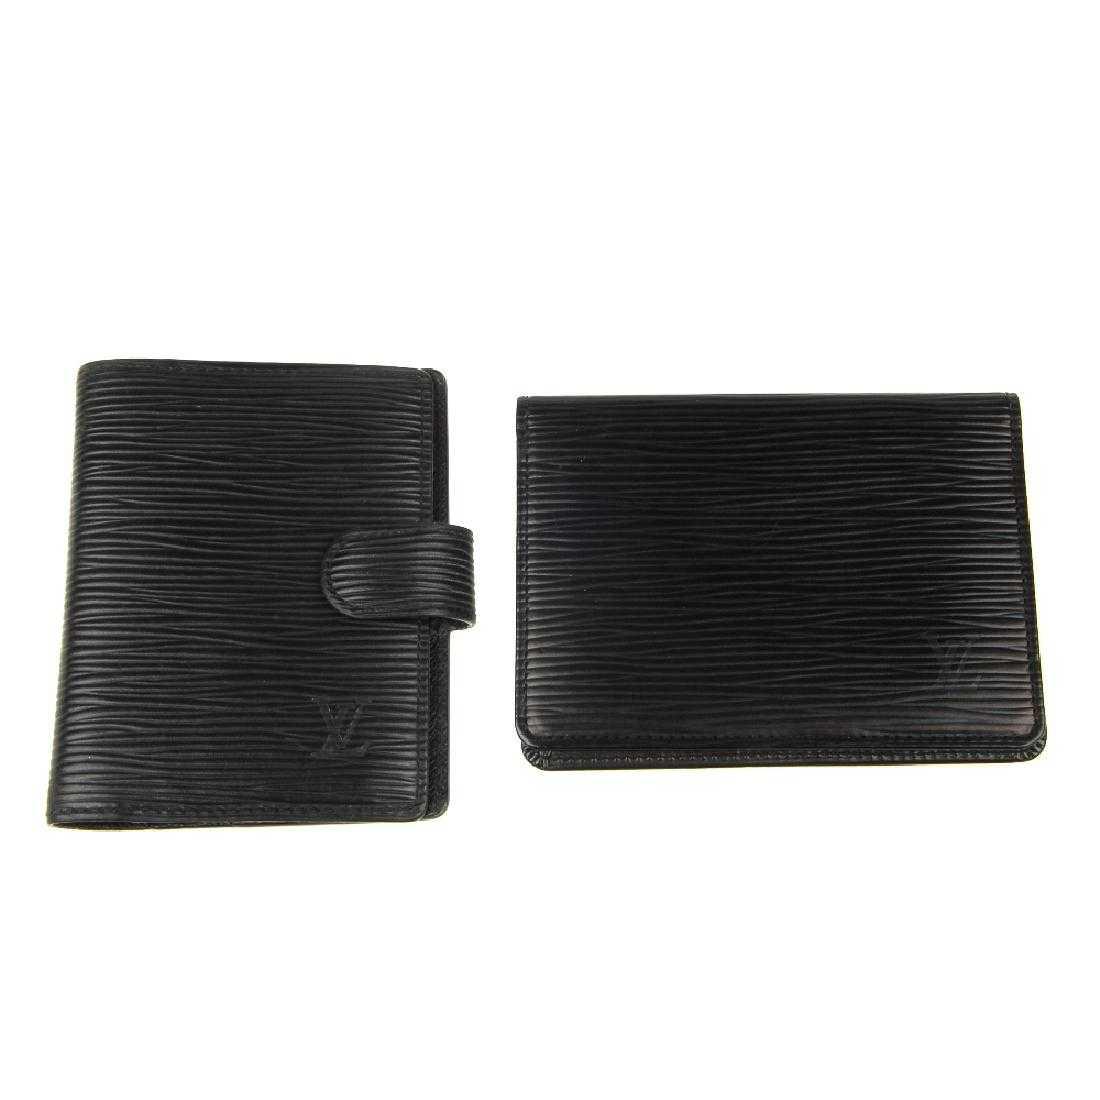 c1baa2180f2c LOUIS VUITTON - two black Epi leather wallets. To